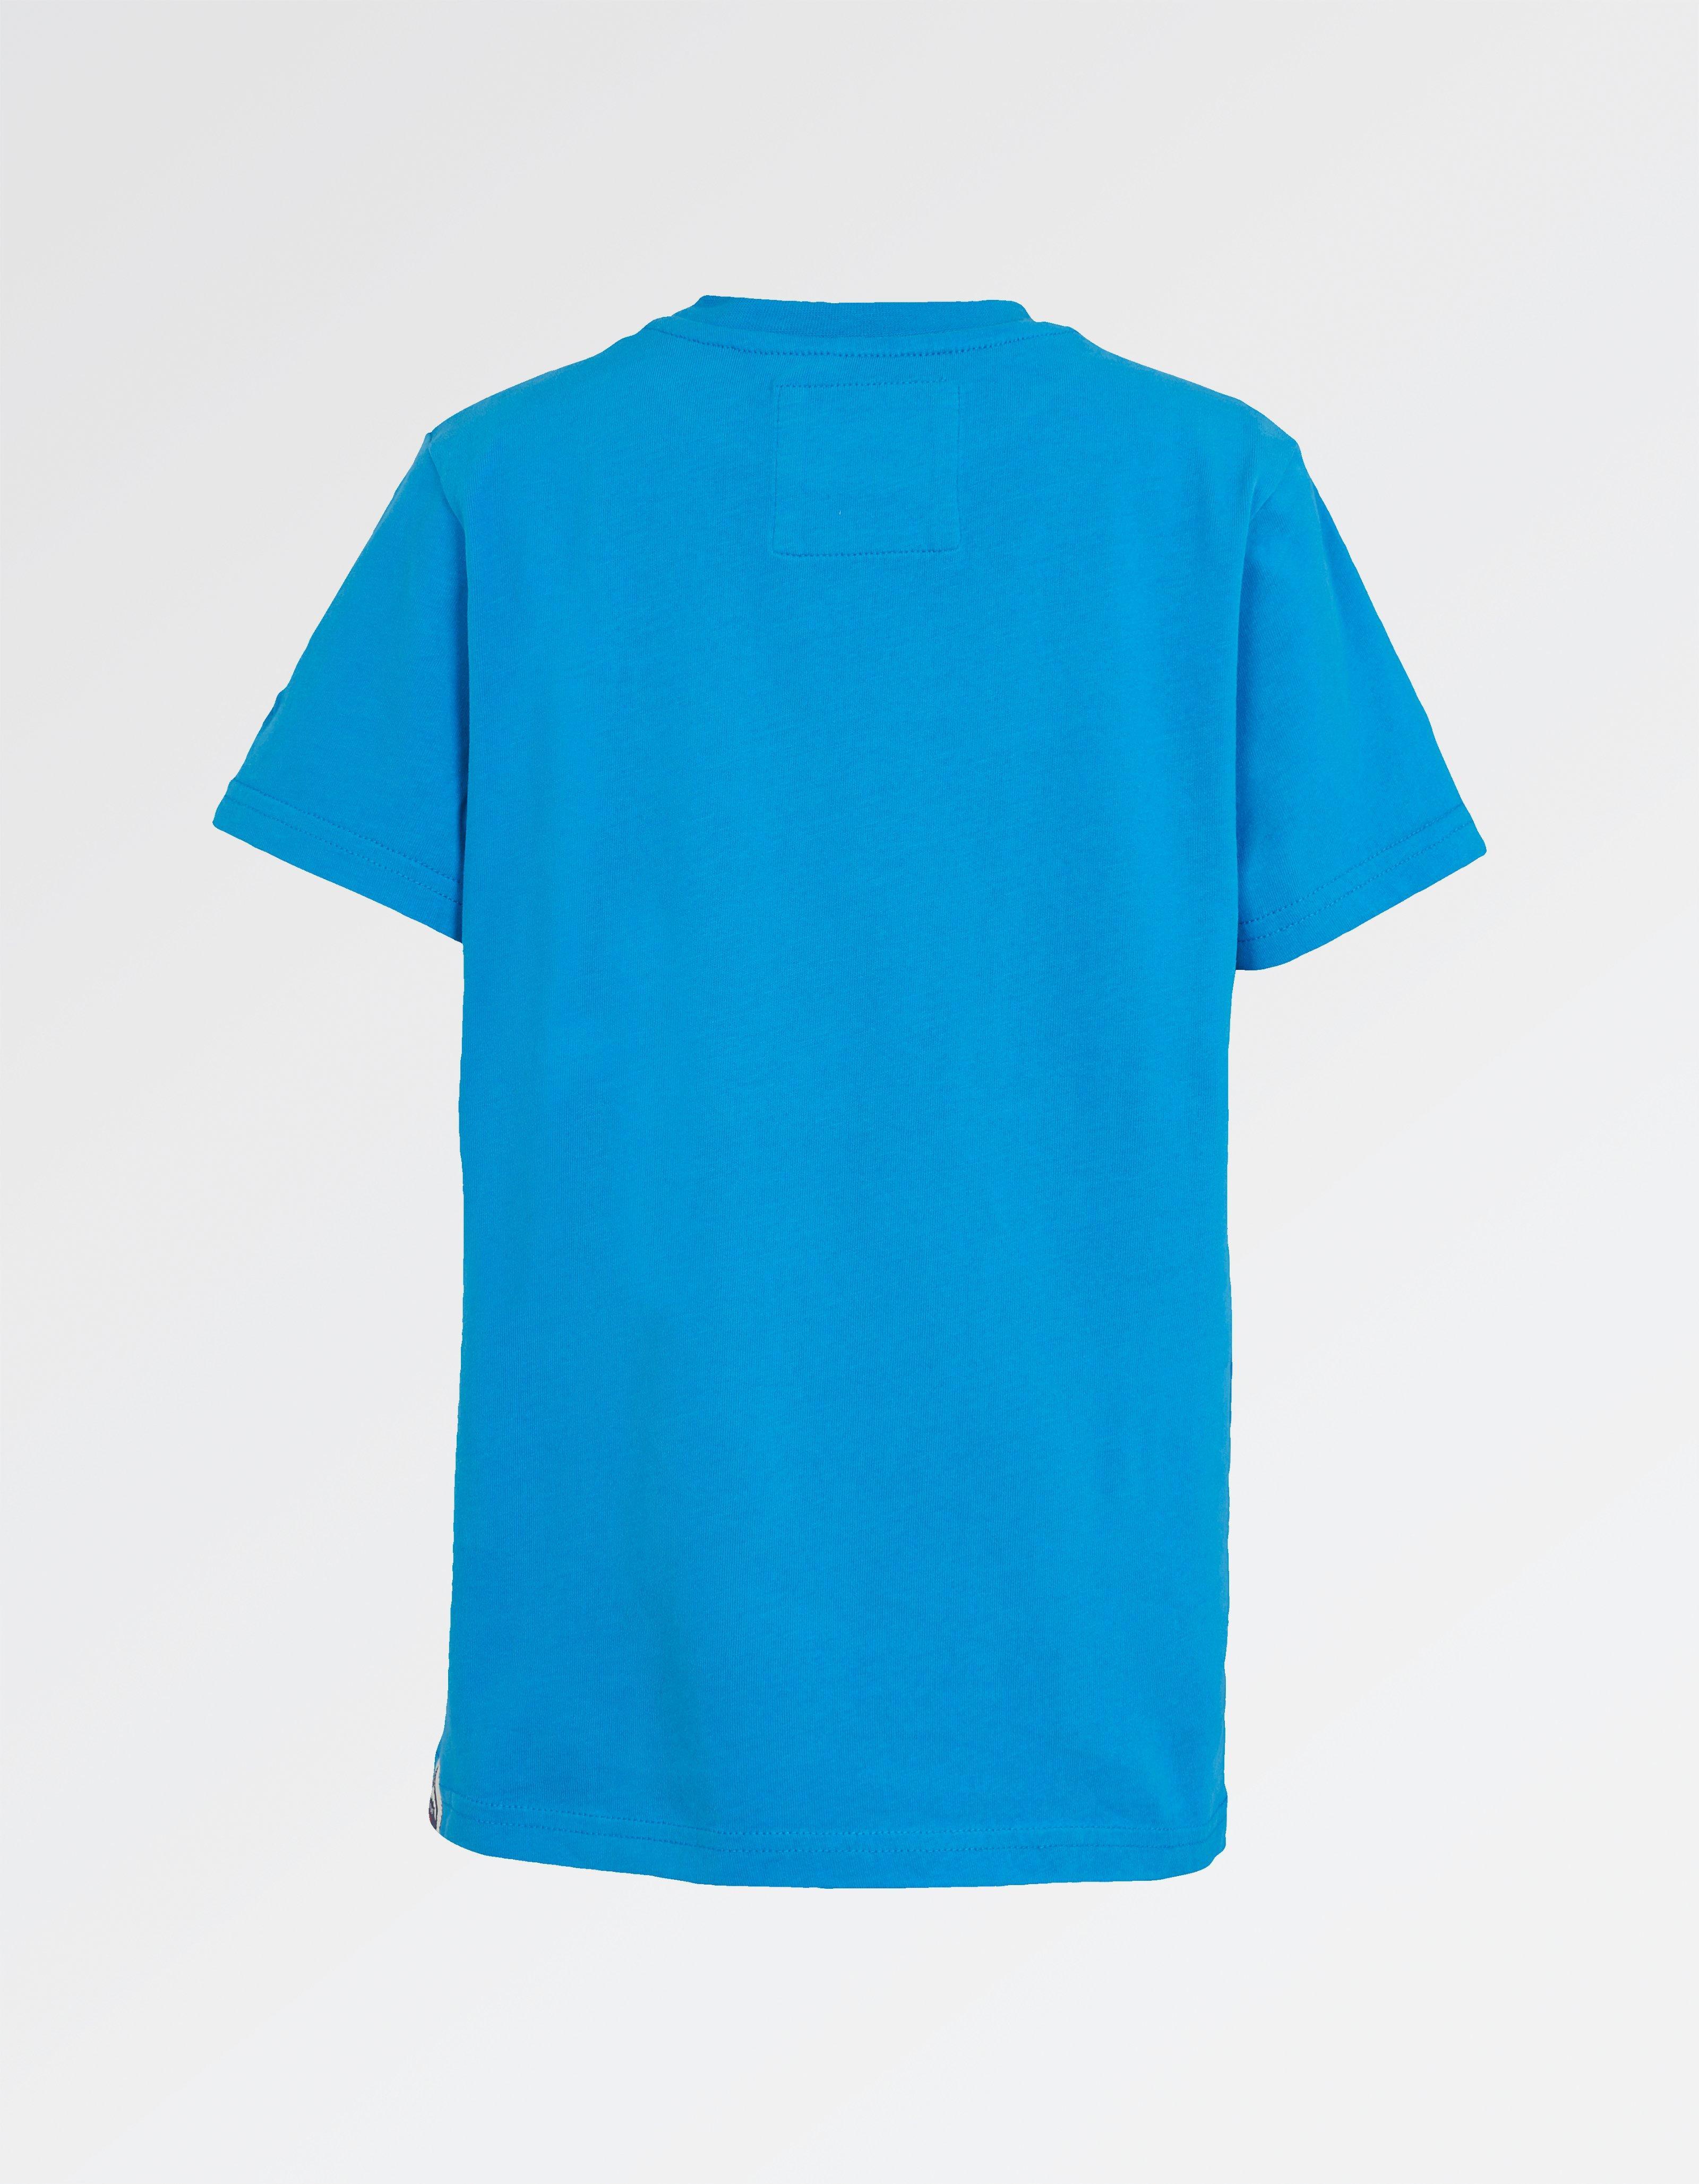 Wave Rider Graphic T Shirt